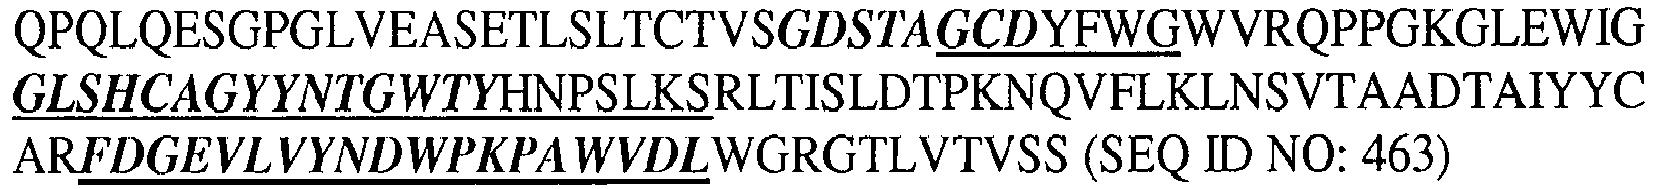 Figure imgb0349